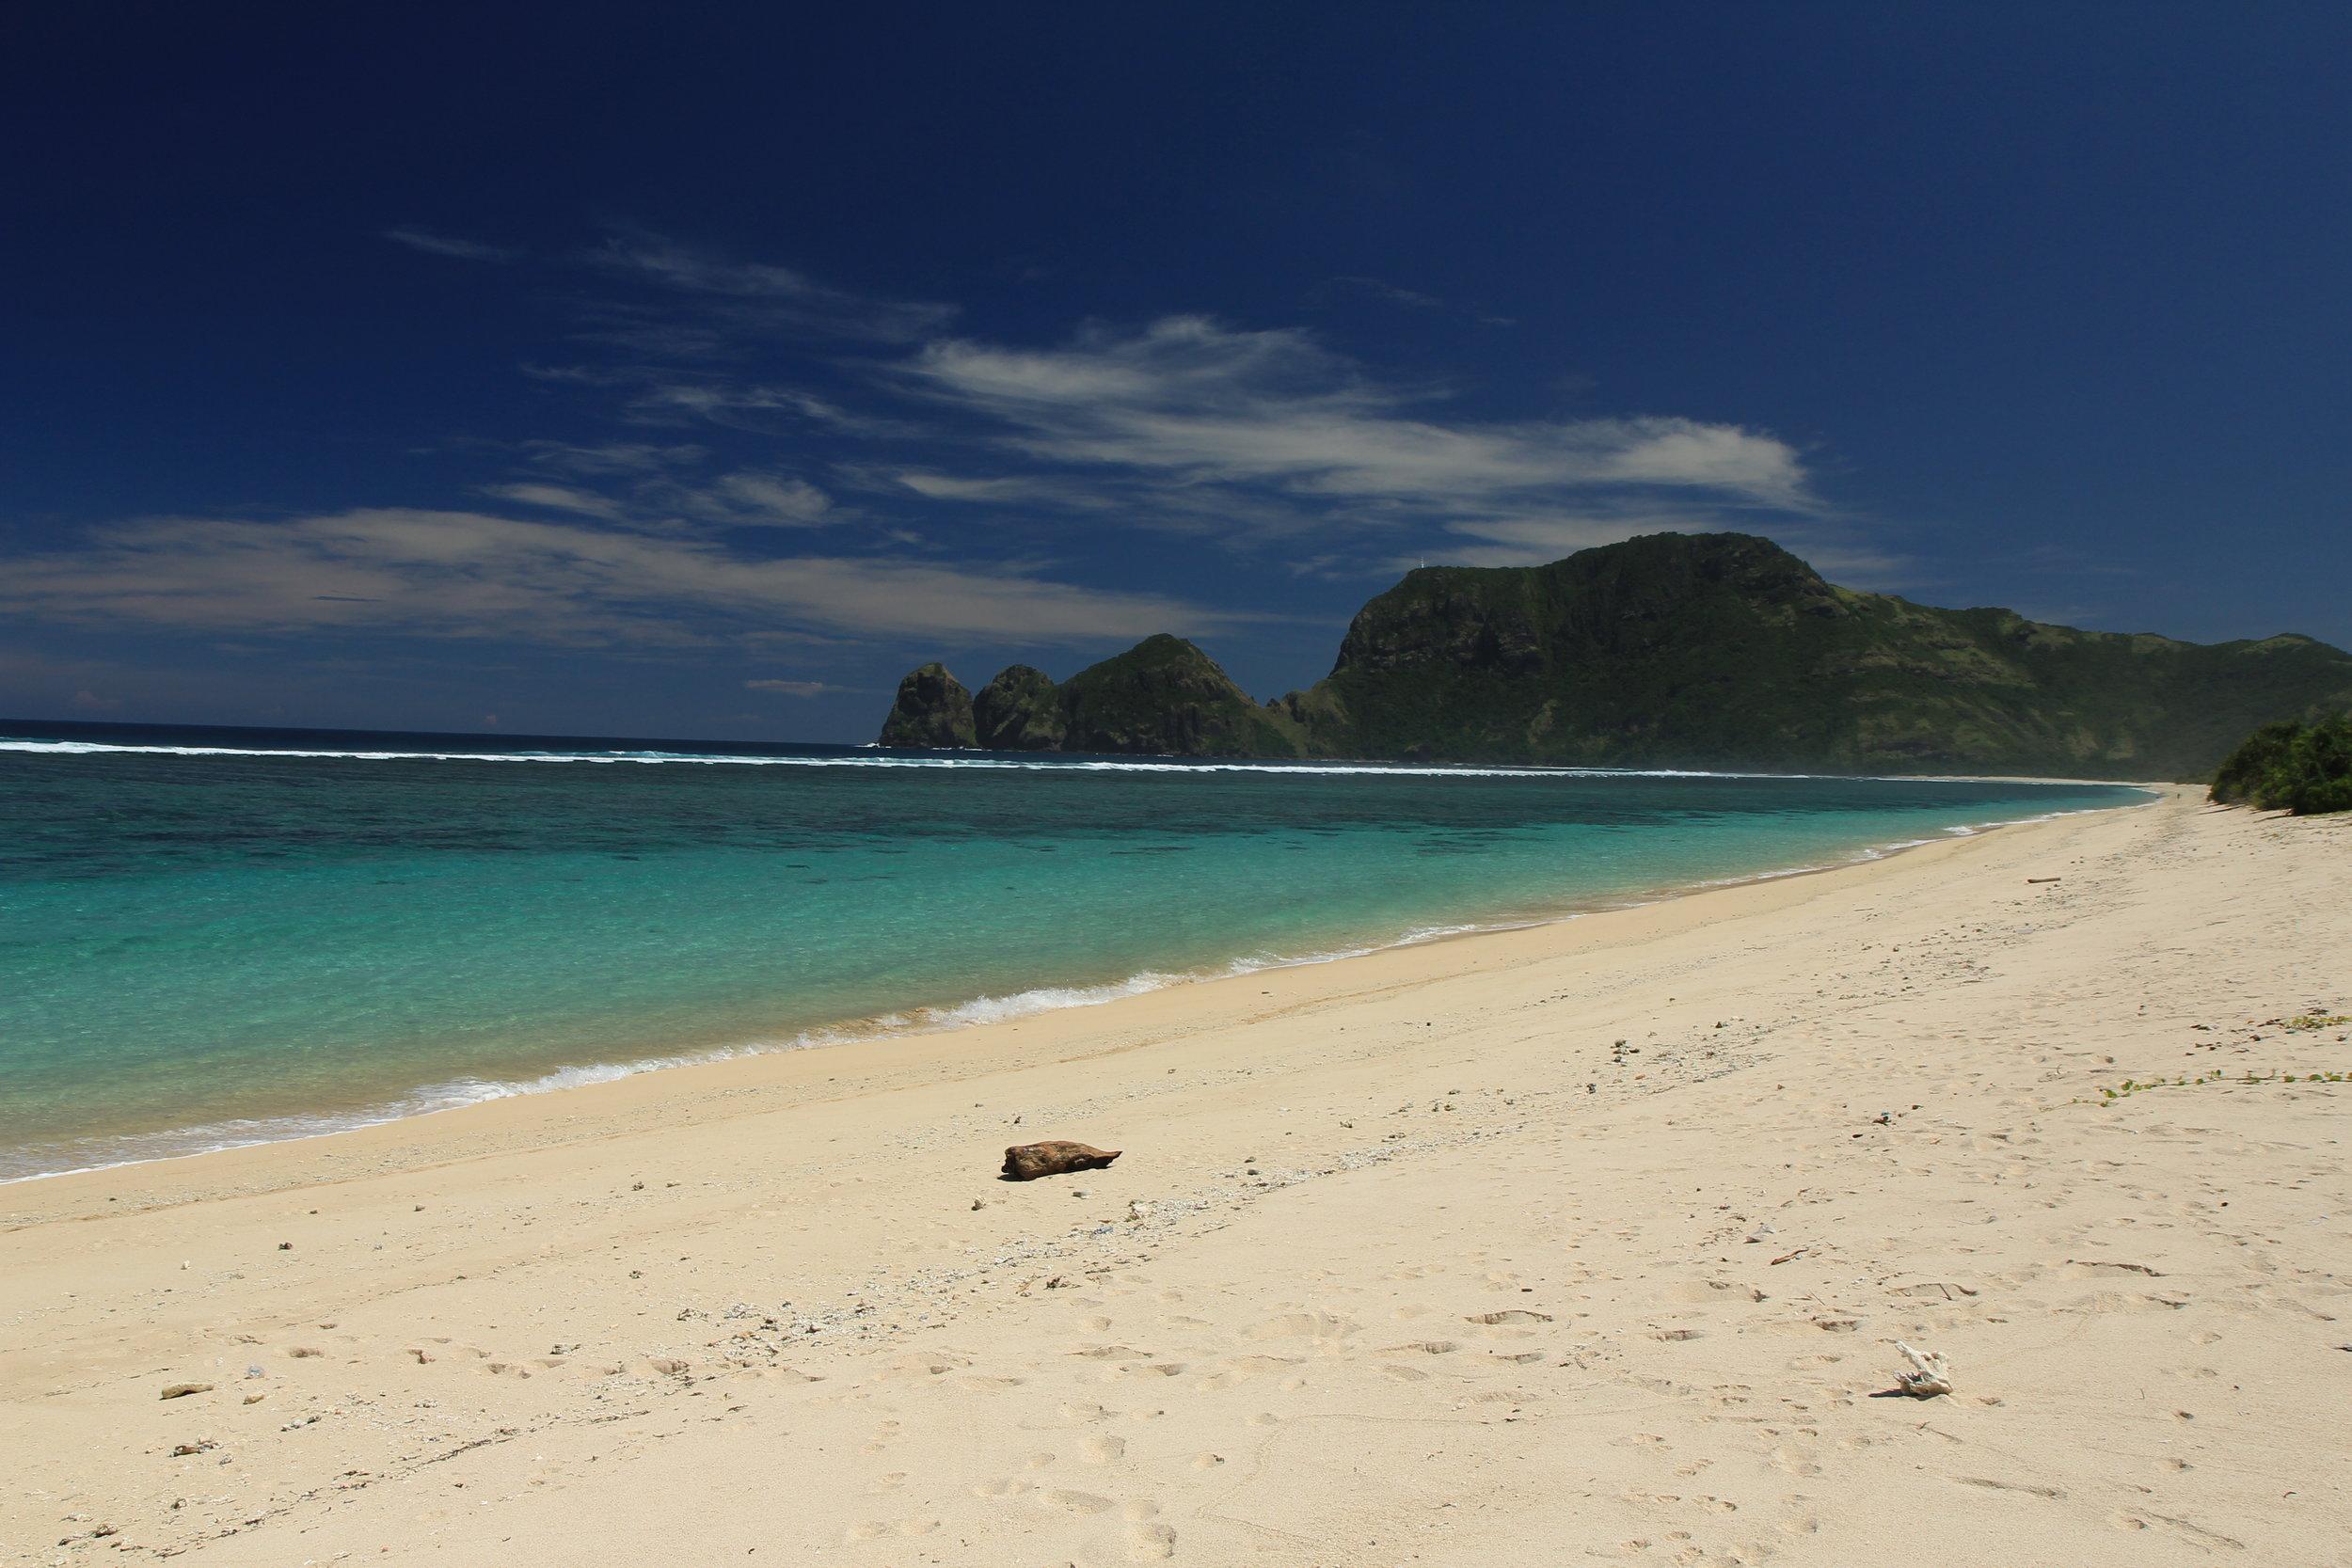 Sandy beach and blue ocean